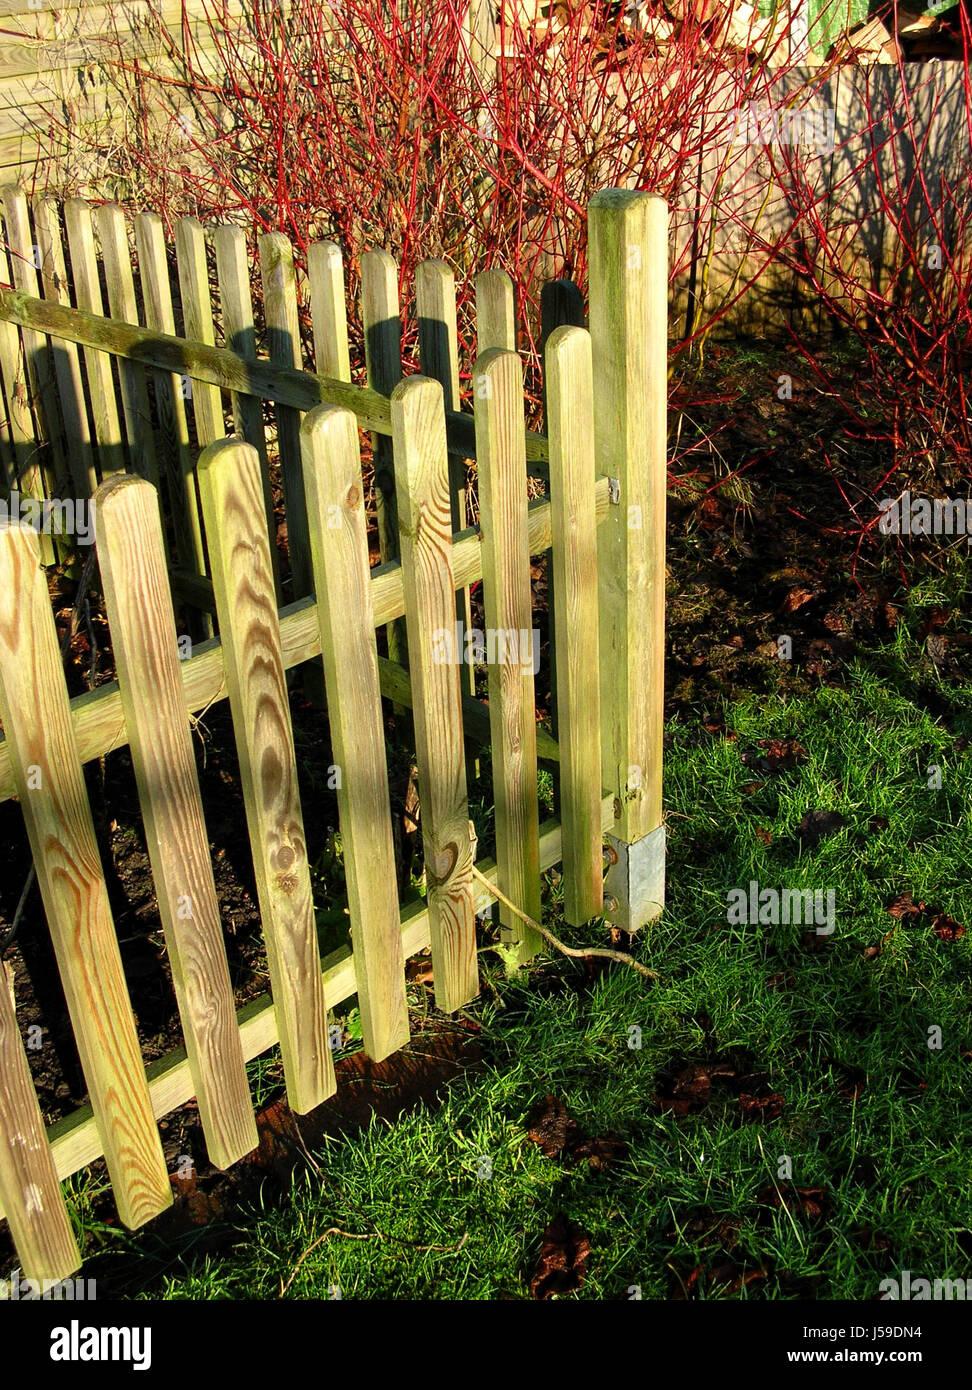 Gartenzaun Holz Abgrenzung Nachbarschaft Nachbarn Garten Wiese Rasen